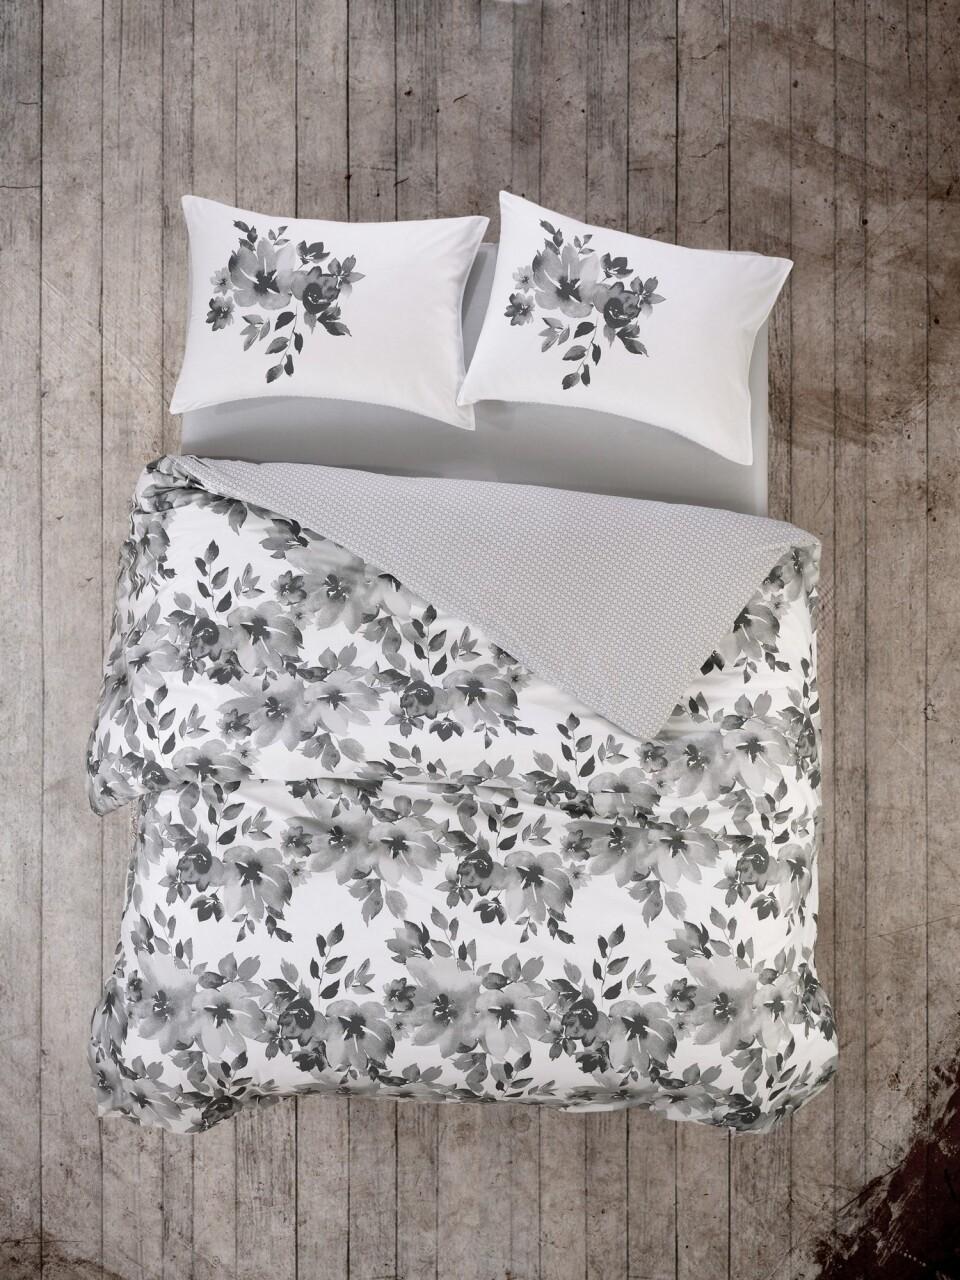 Lenjerie de pat pentru o persoana, 3 piese, 100% bumbac ranforce, Cotton Box, Volante